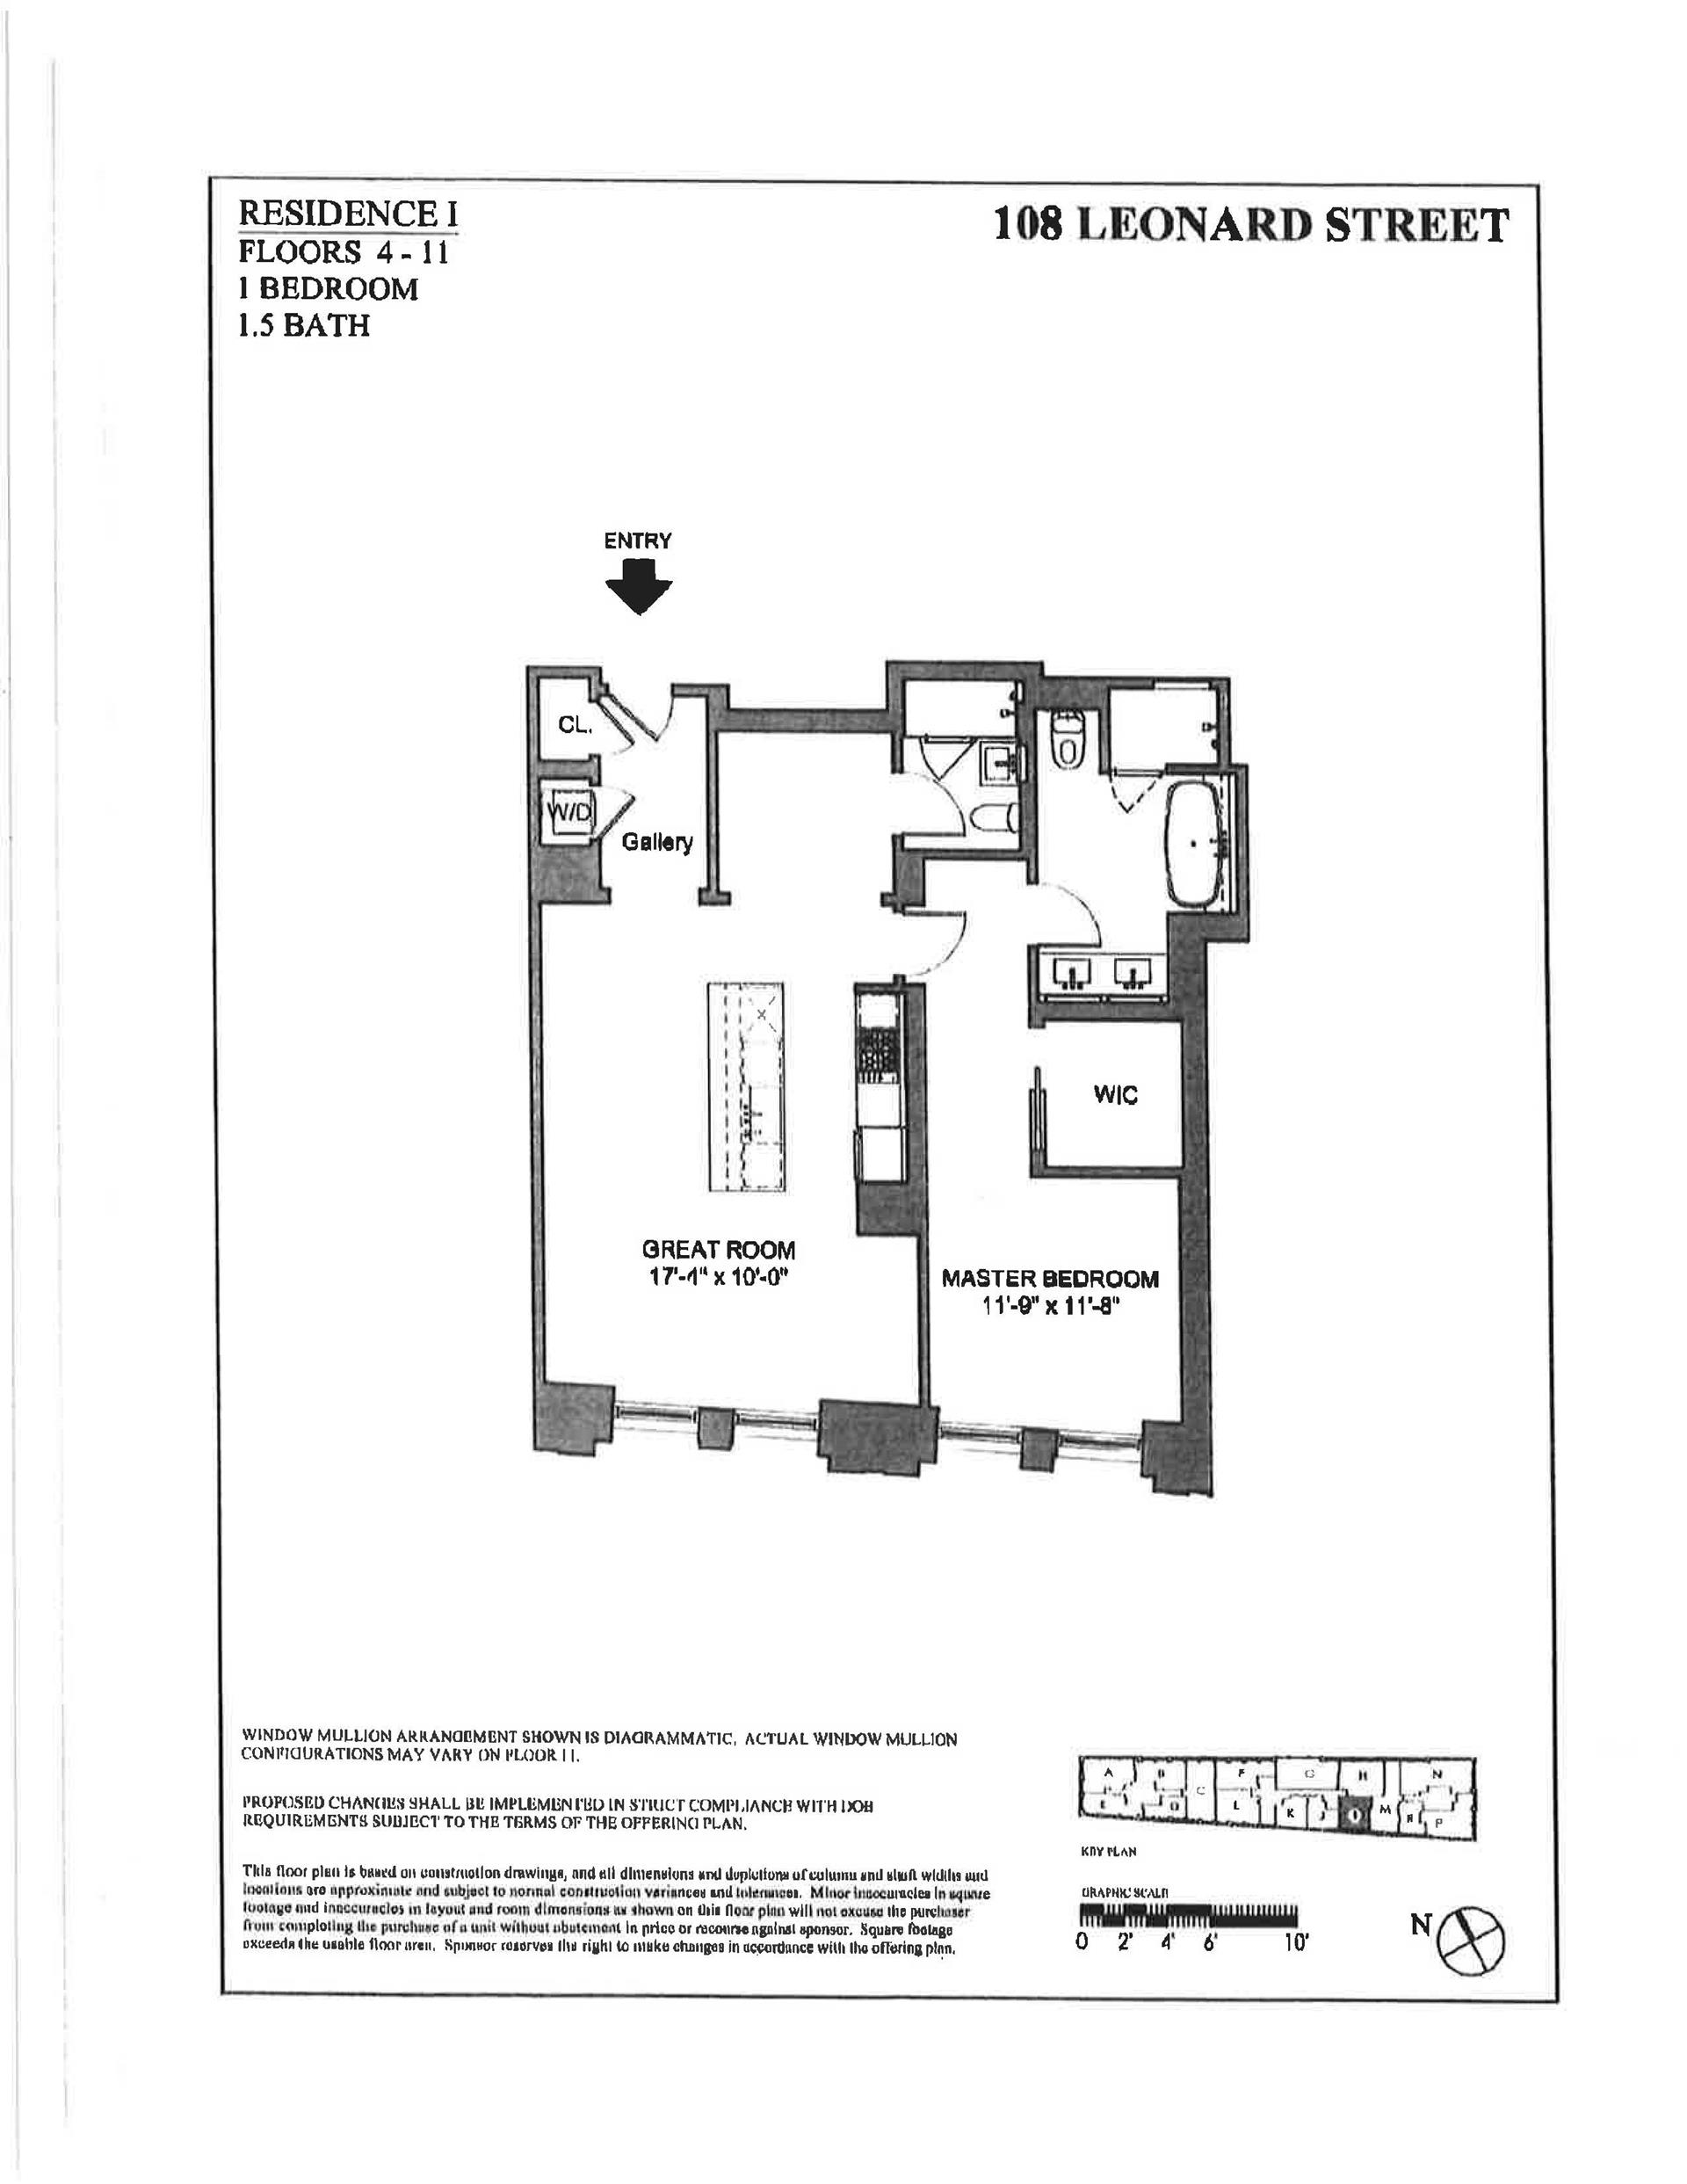 Floor plan of 108 Leonard St, 7I - TriBeCa, New York